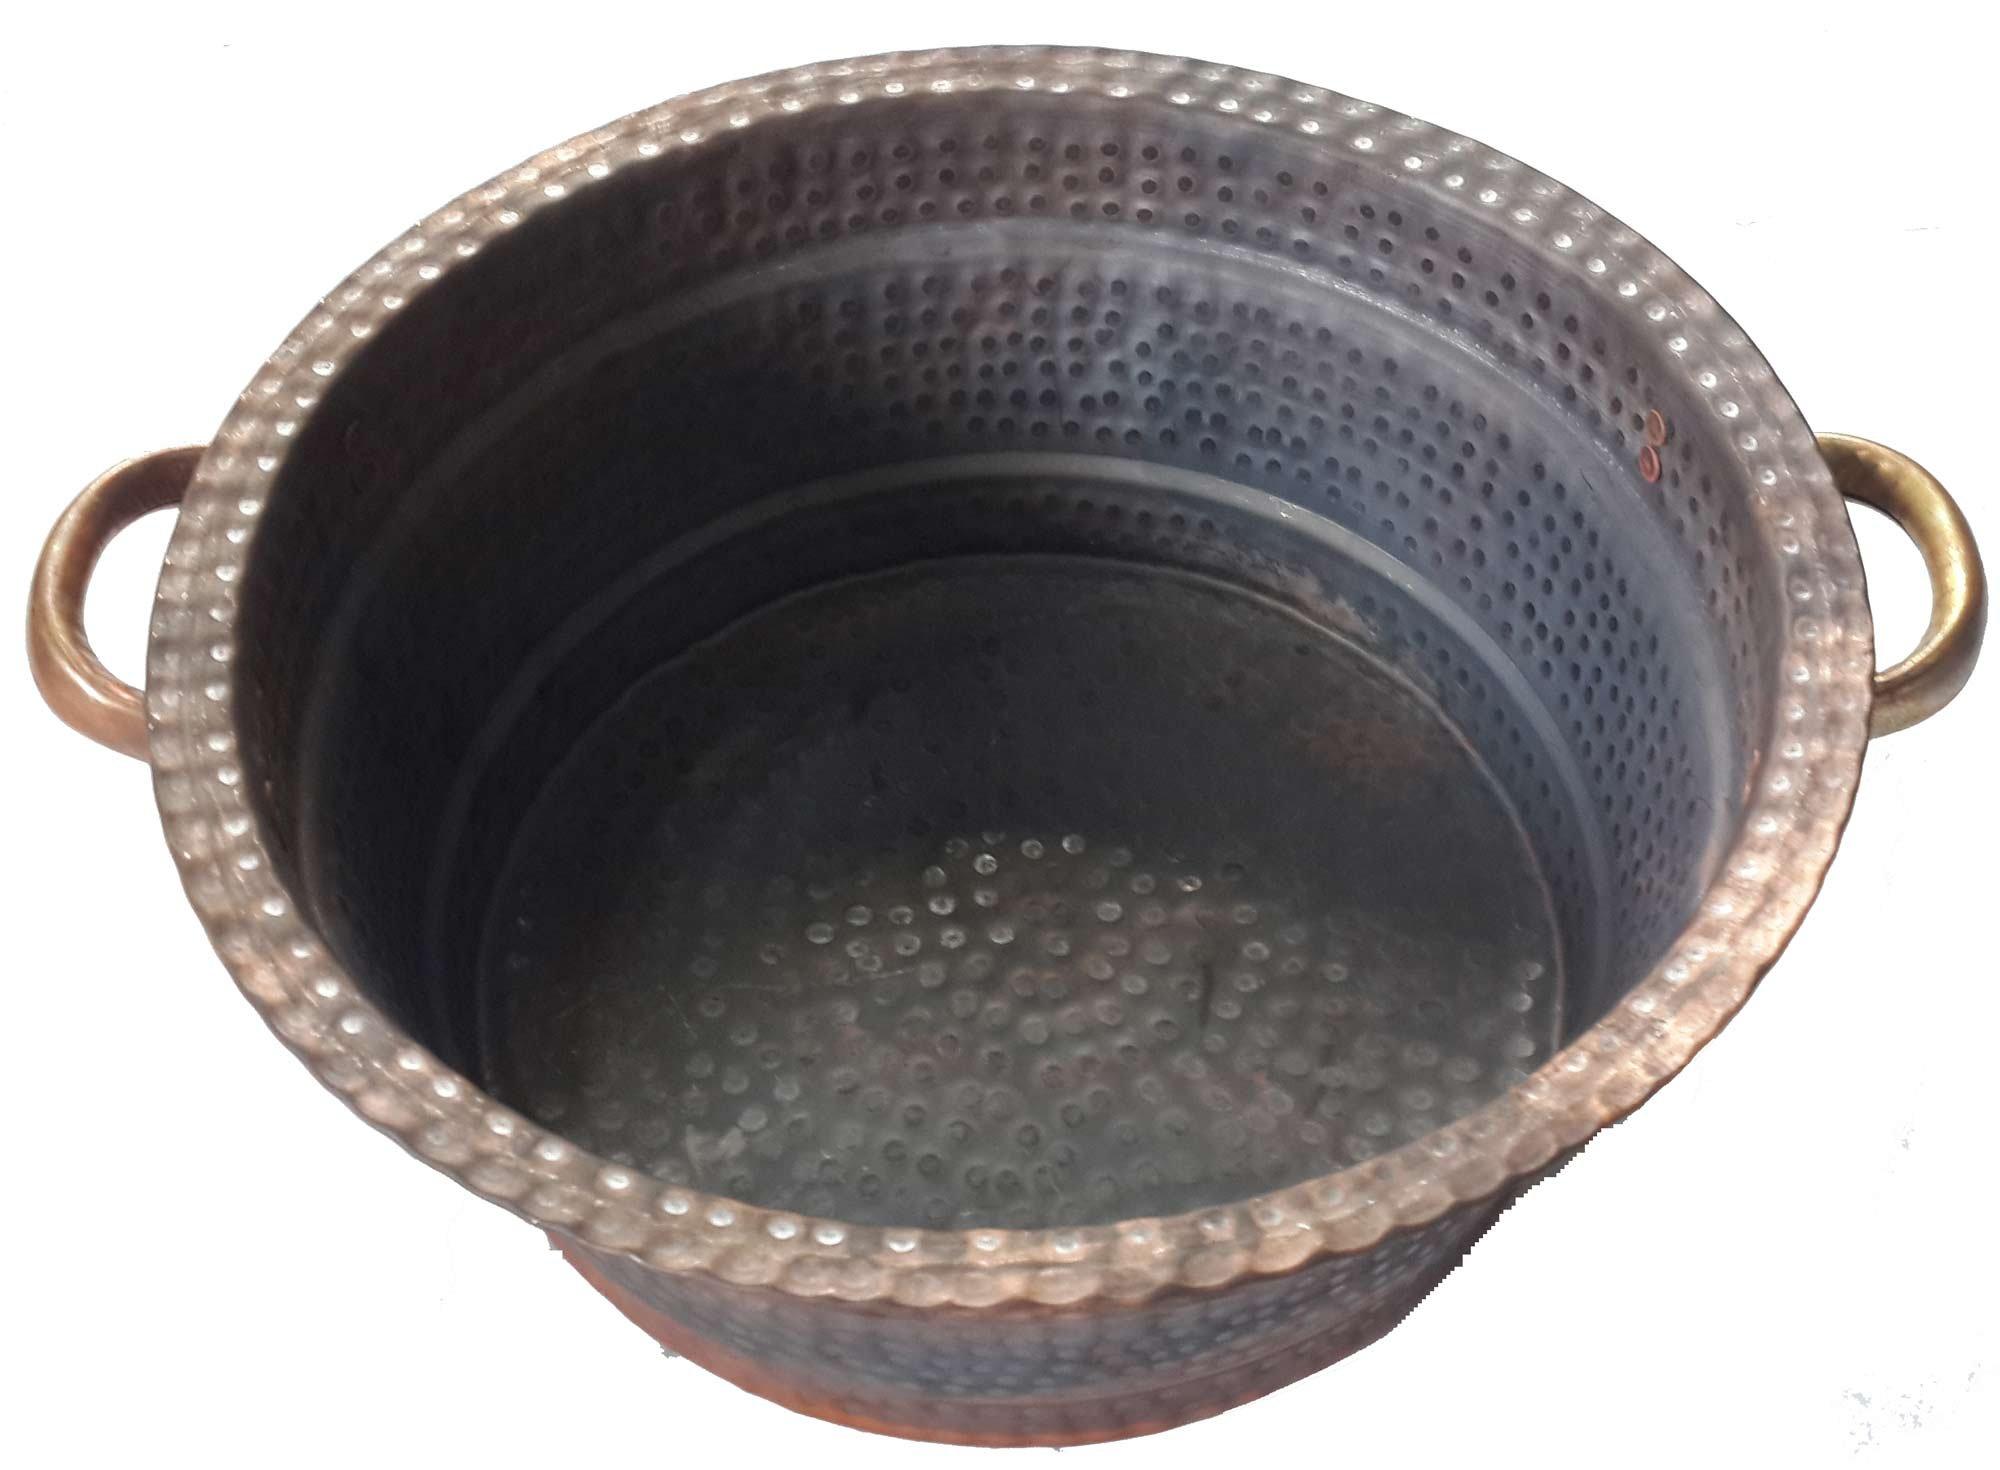 Egypt gift shops Petite Fire Burnt Diabetic Foot Massage Bath Pedicure Spa Beauty Salon Handles Bowl